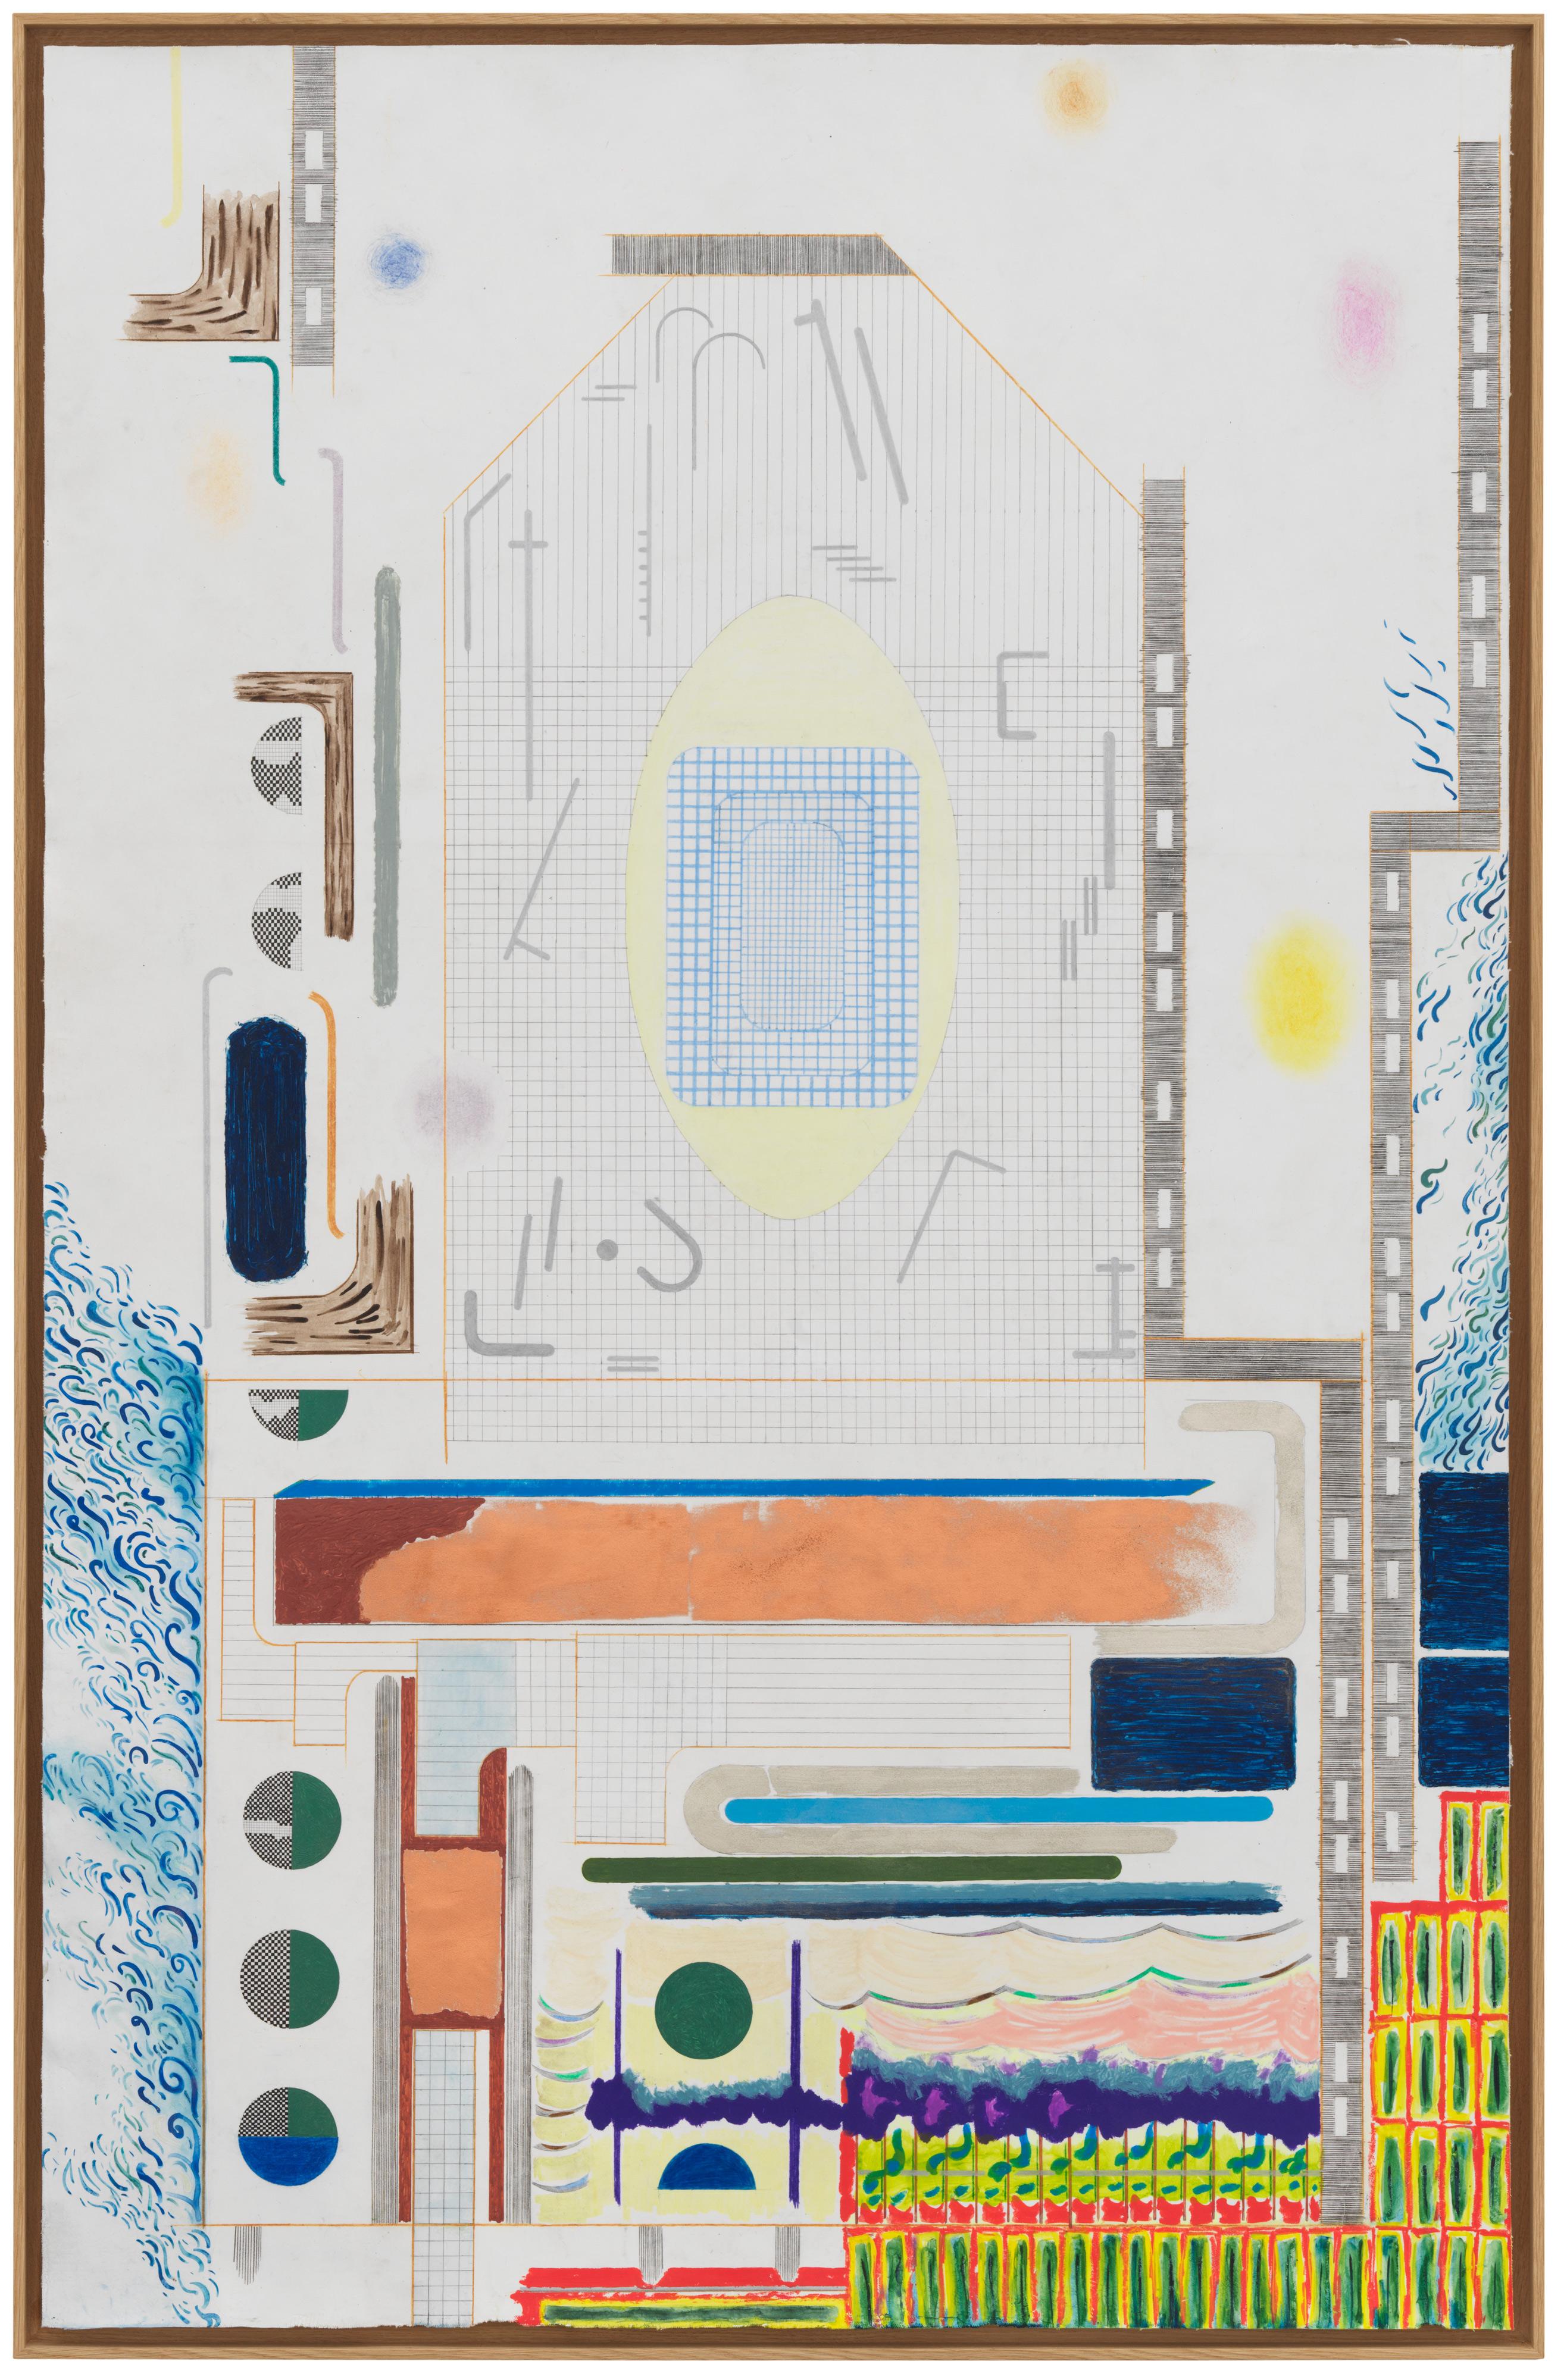 Galerie Barbara Thumm \ New Viewings #3 \ New Viewings #3